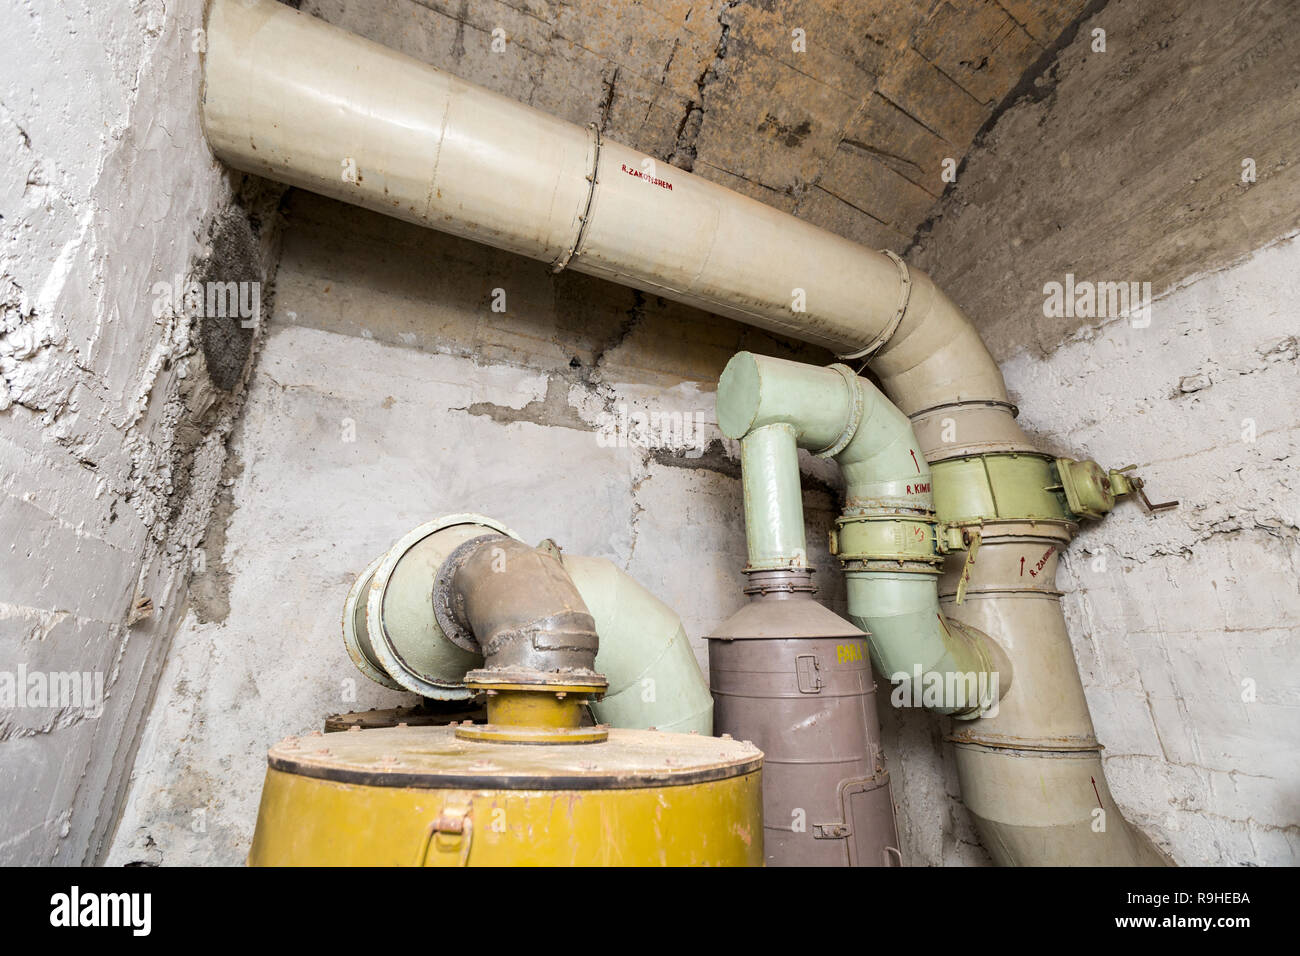 Ventilation filter room Bunk'Art nuclear bunker Tirana Albania - Stock Image